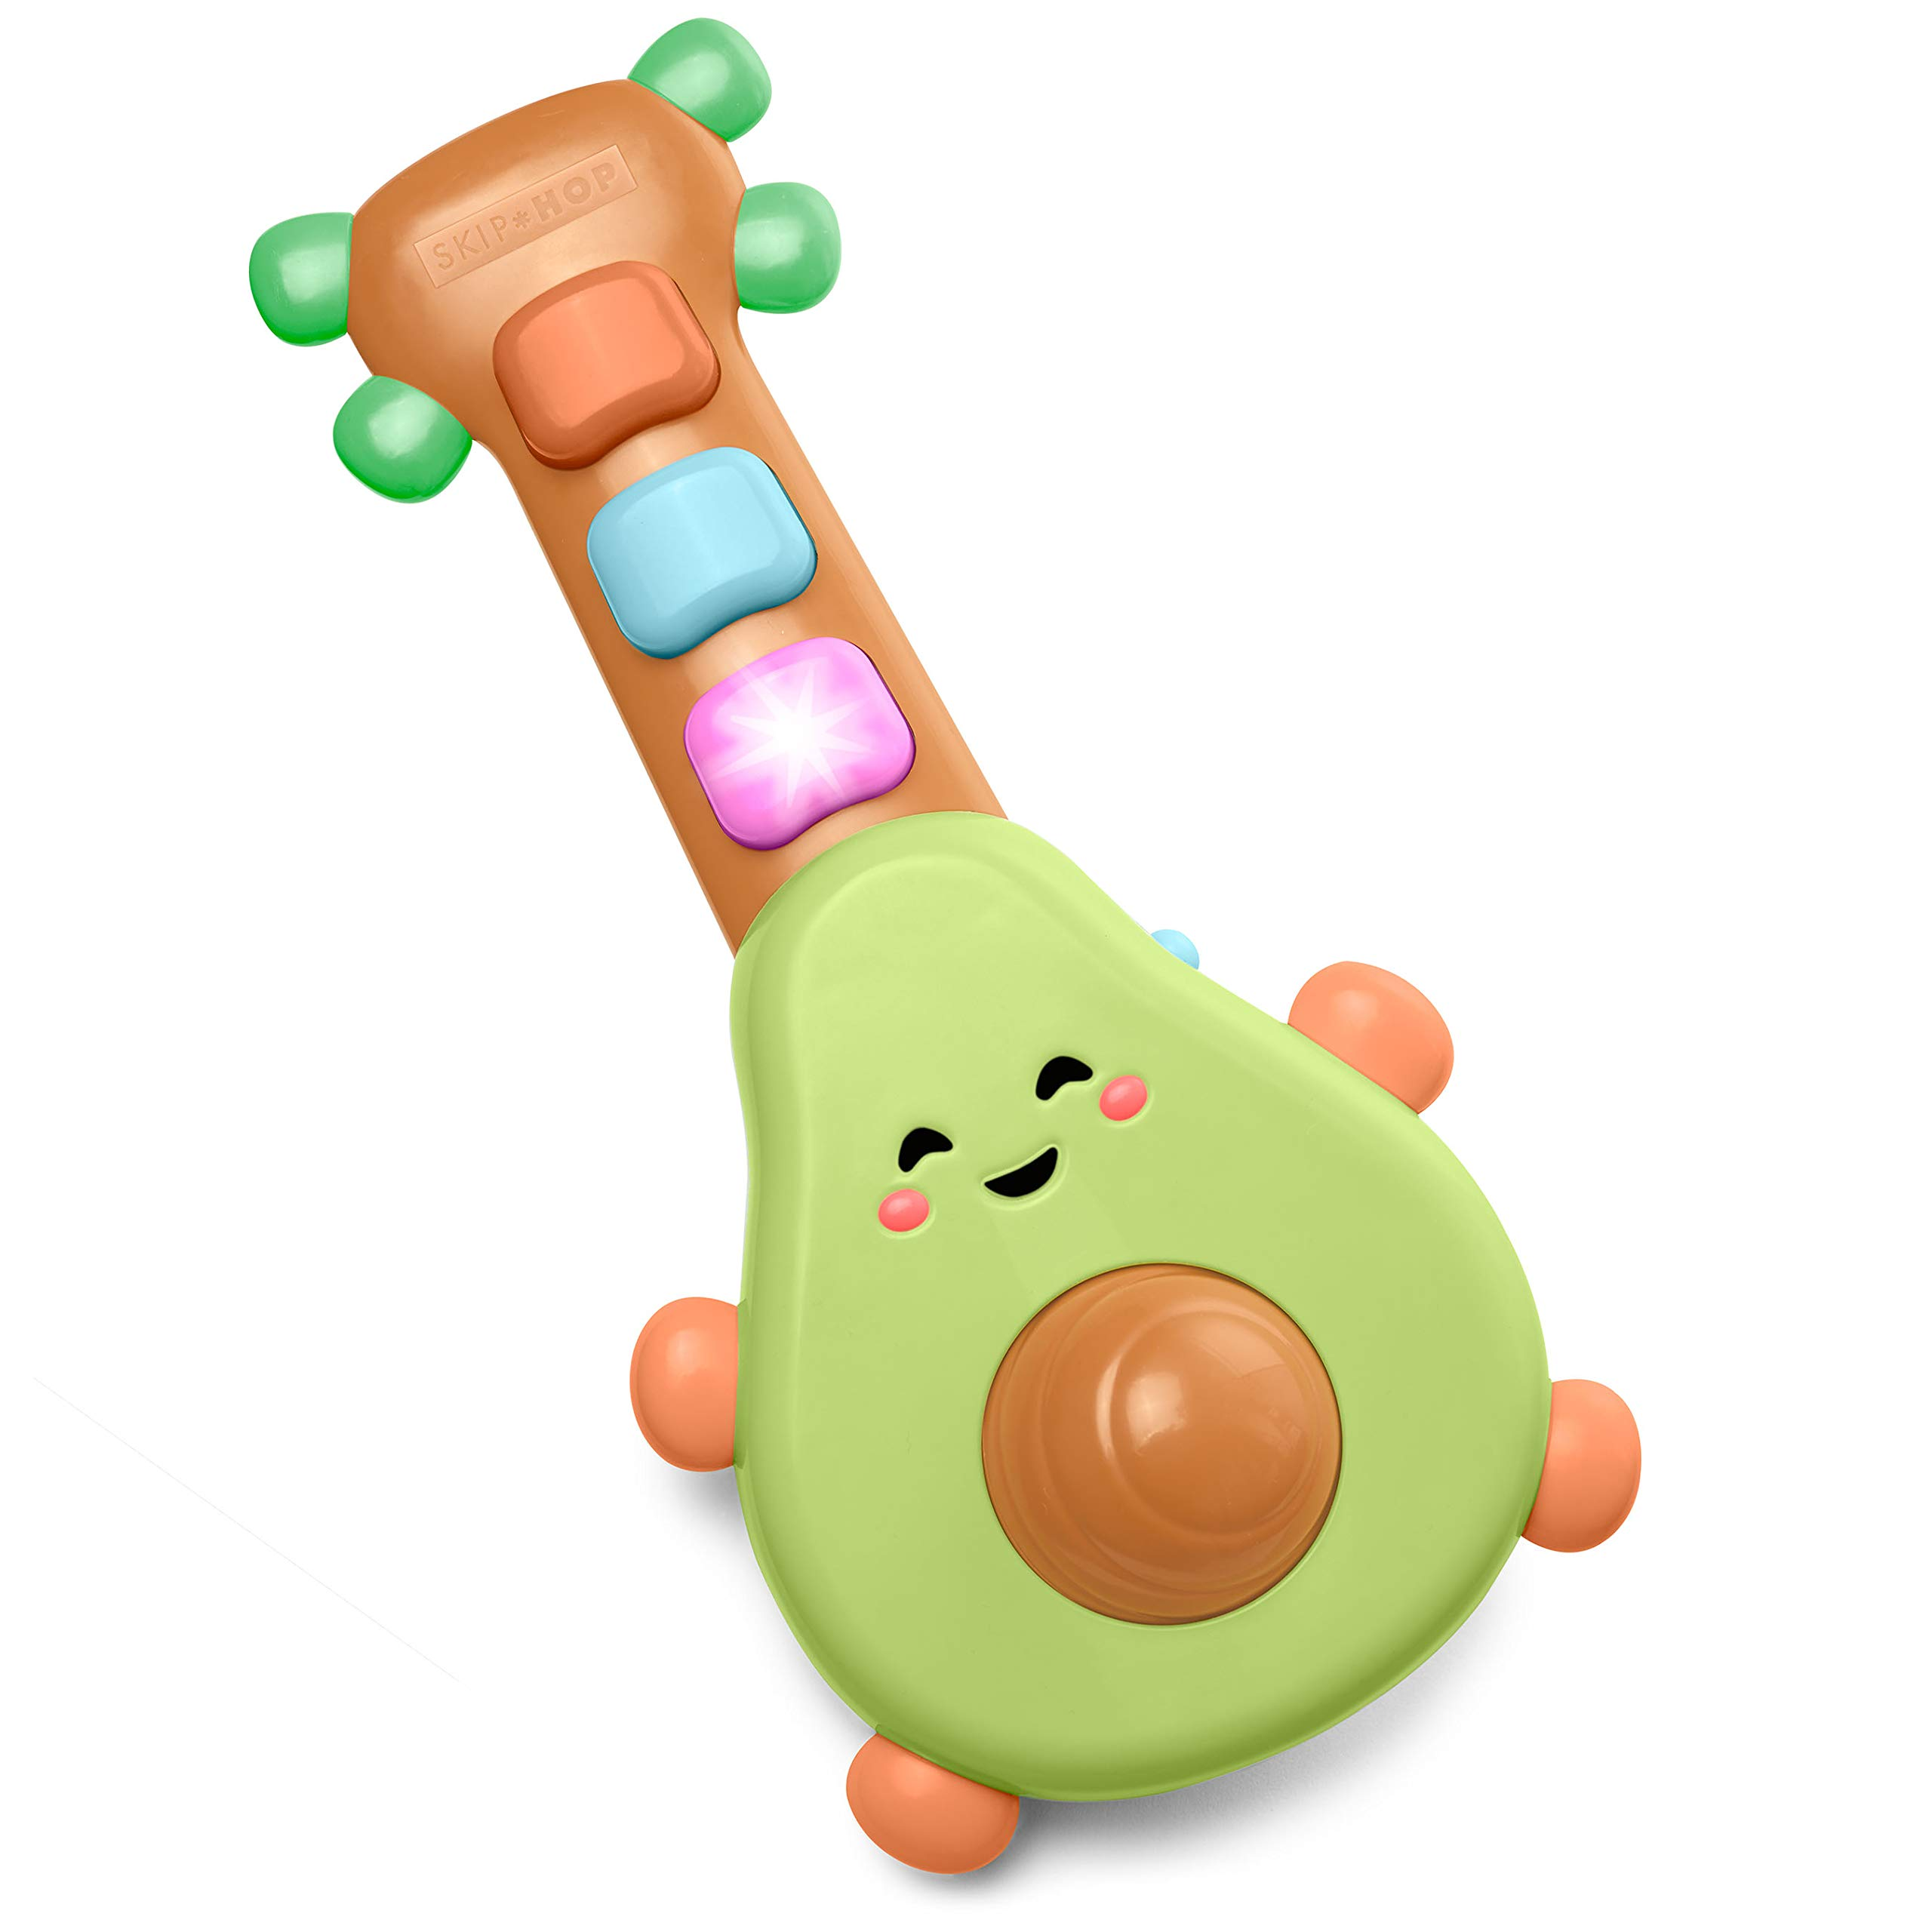 Skip Hop Baby Guitar Developmental Musical Toy, Farmstand Rock-A-Mole Guitar by Skip Hop